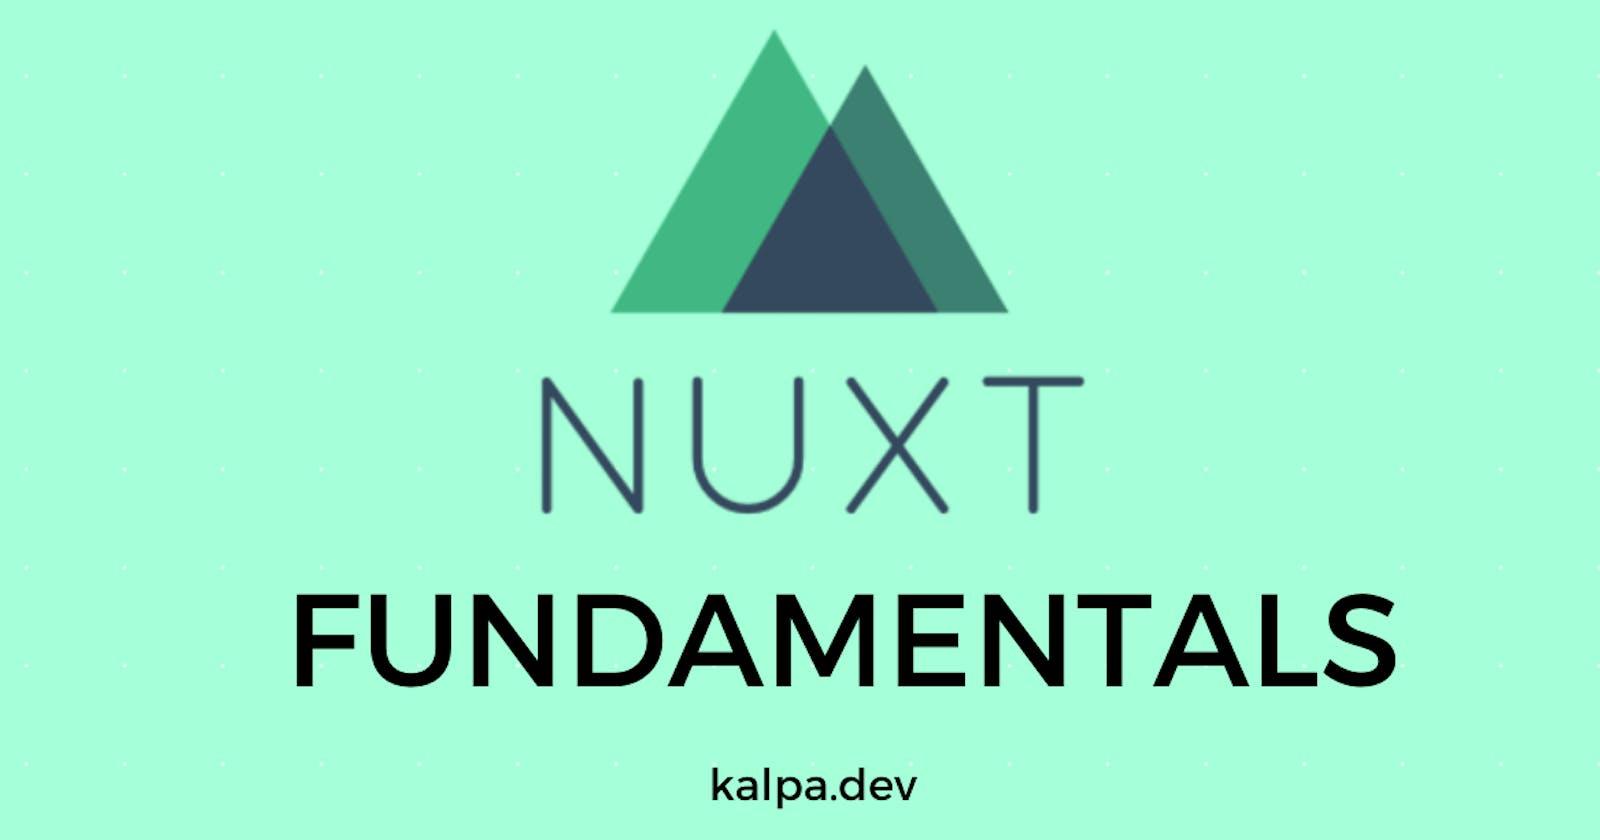 Nuxtjs Fundamentals: Hello, World!